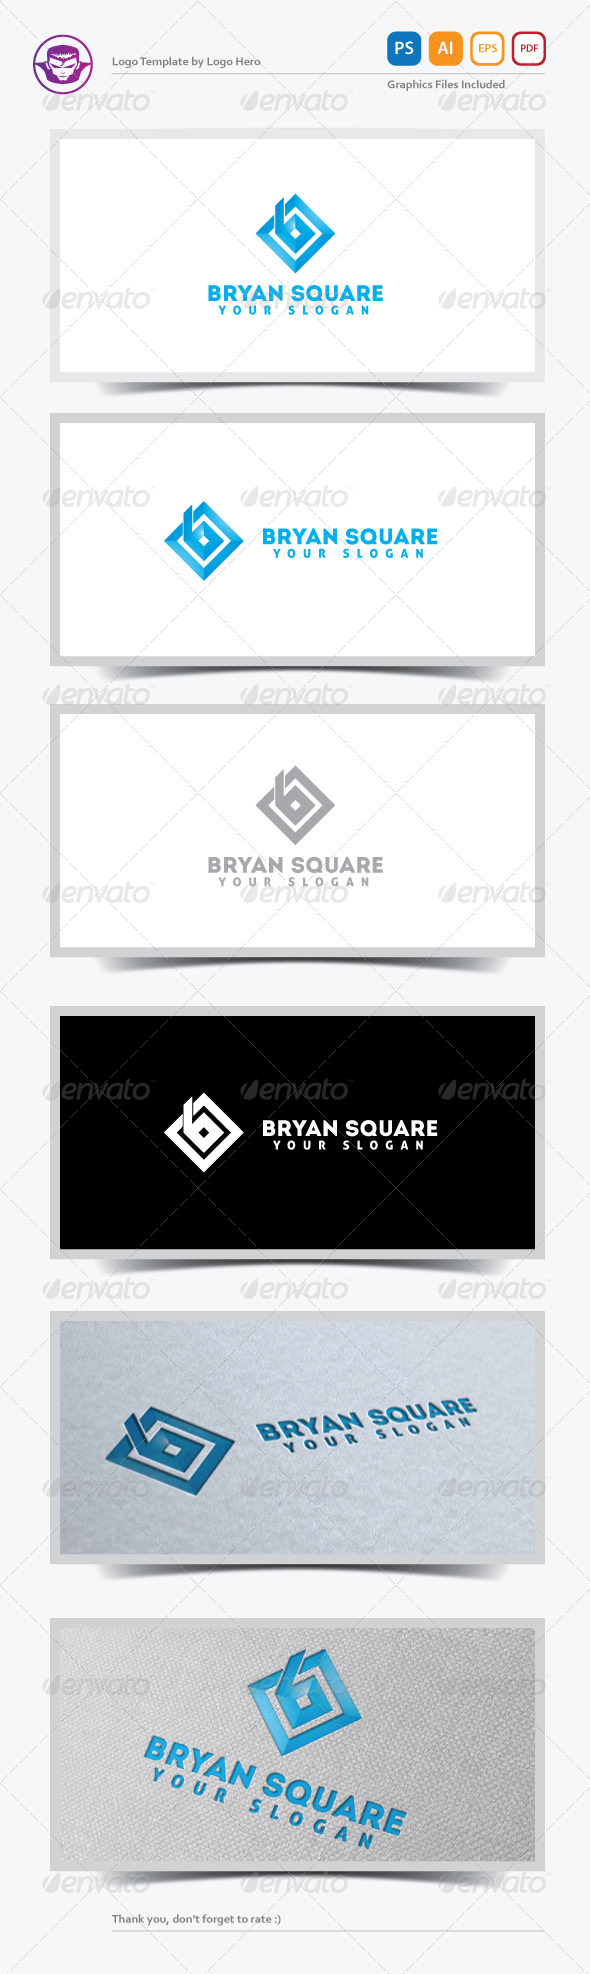 Bryan Square Logo Template